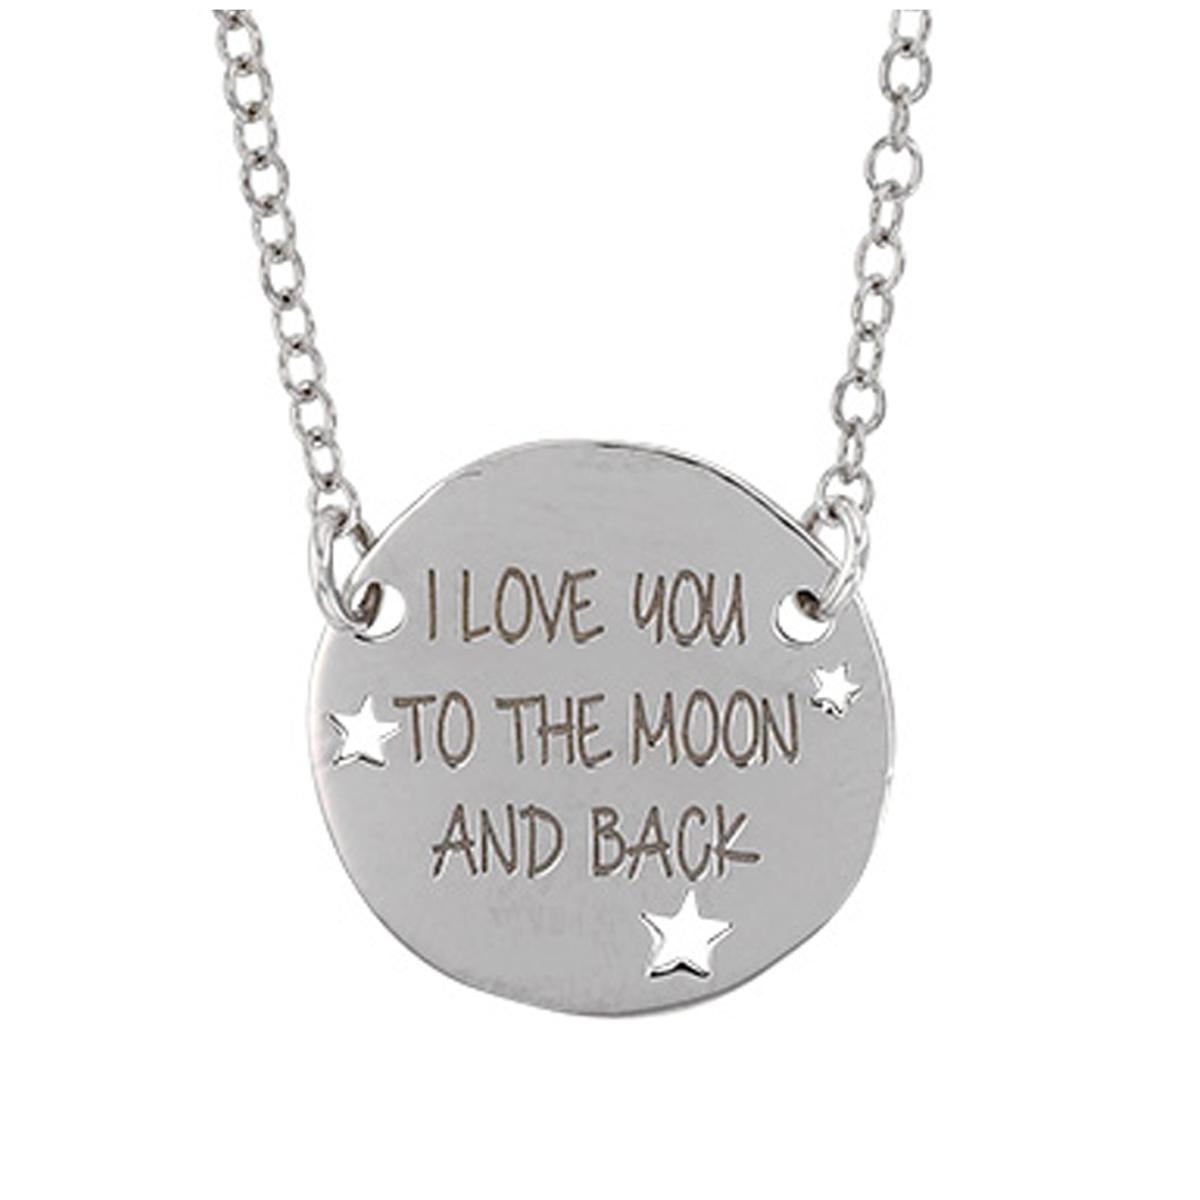 Collier Argent artisanal \'Love\' argenté (rhodié) - 15 mm (I love you to the Moon and back) - [Q9371]